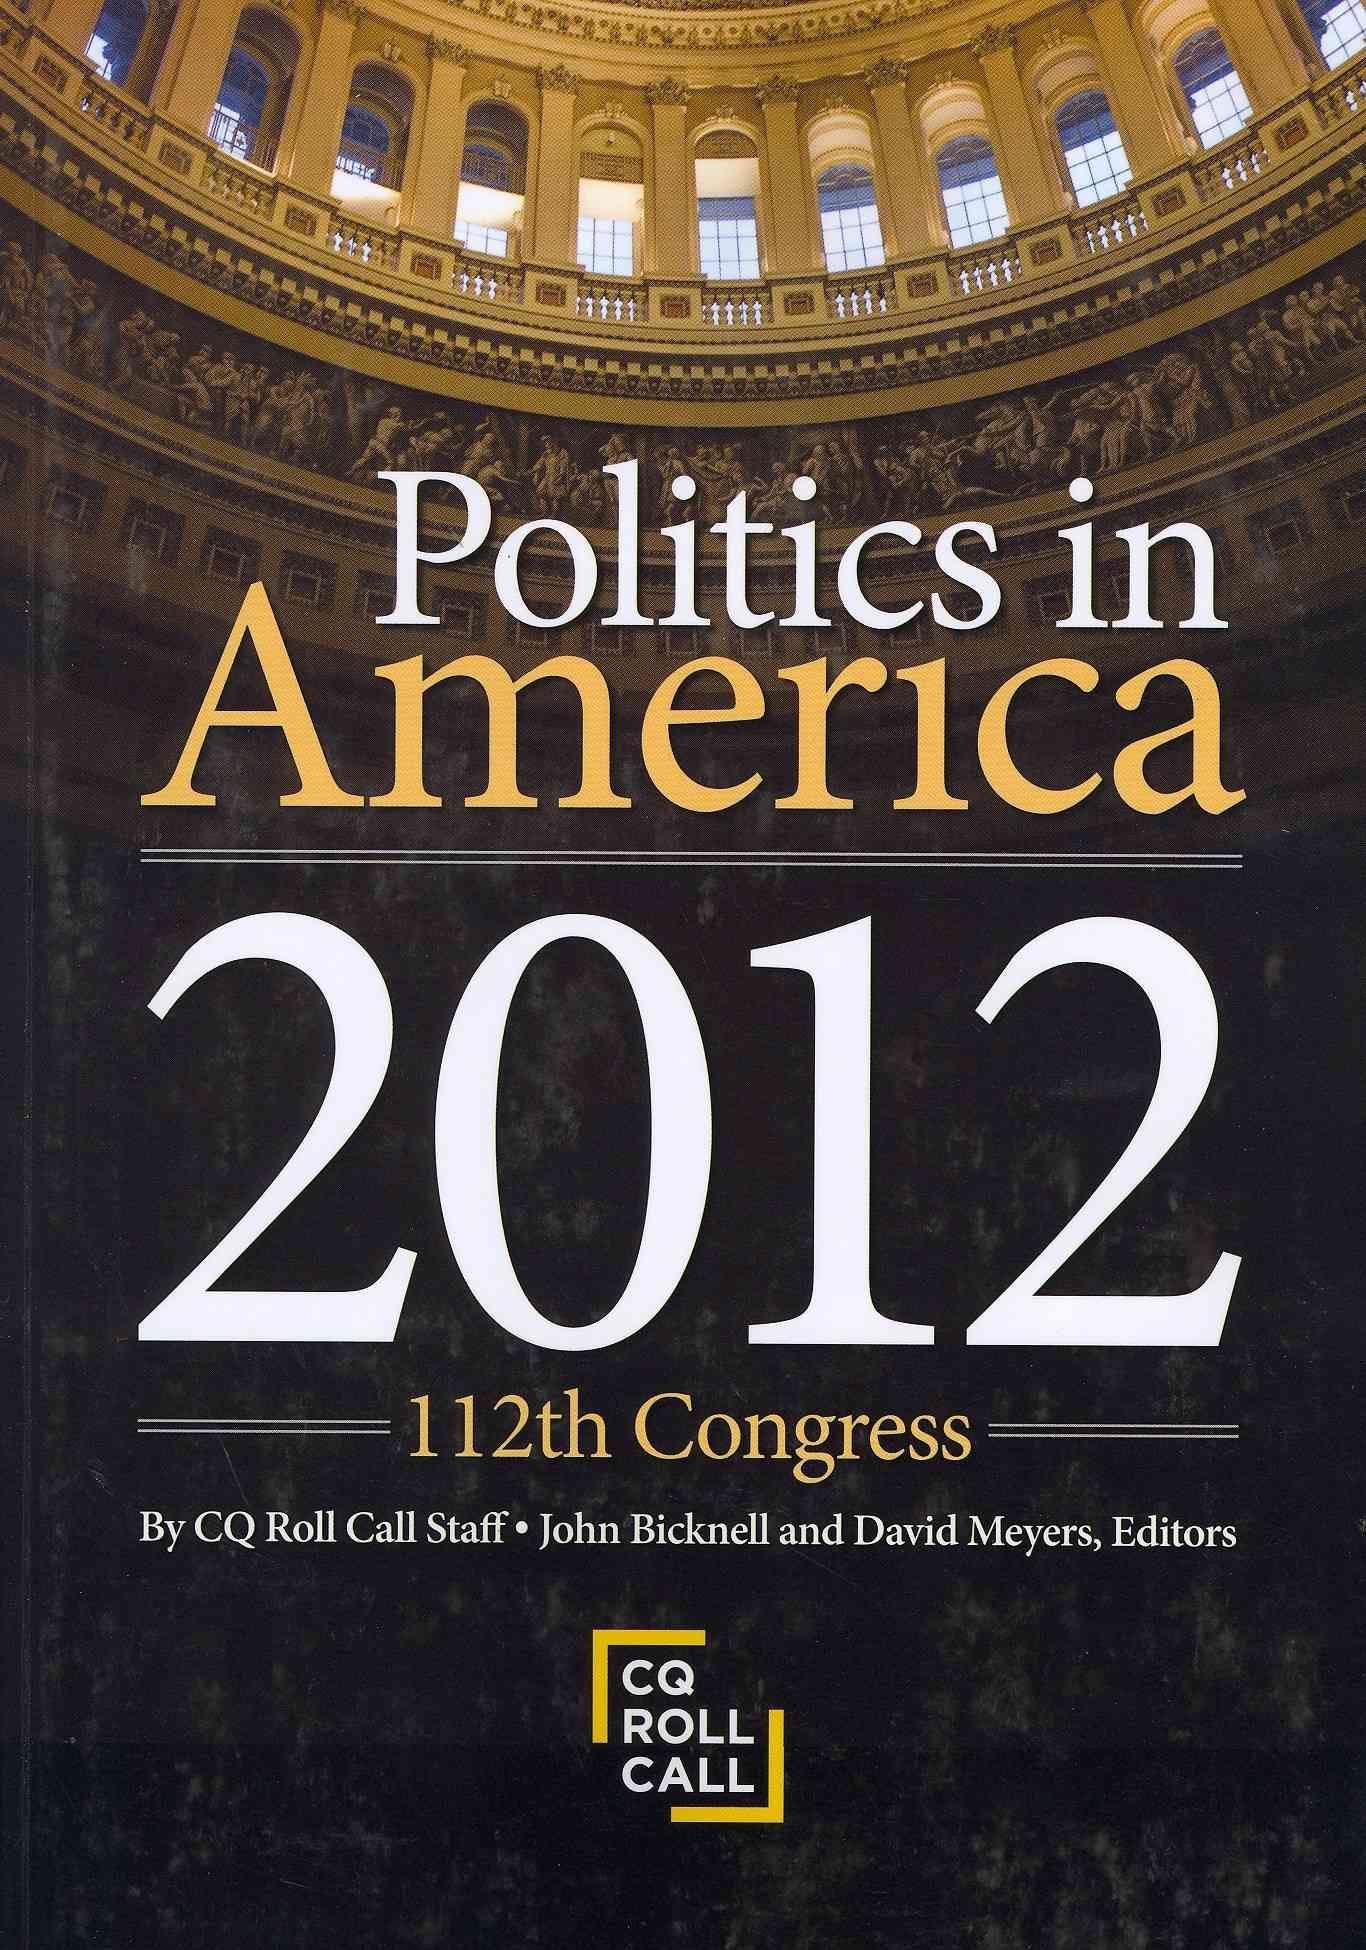 Politics in America 2012: 112th Congress (Paperback)